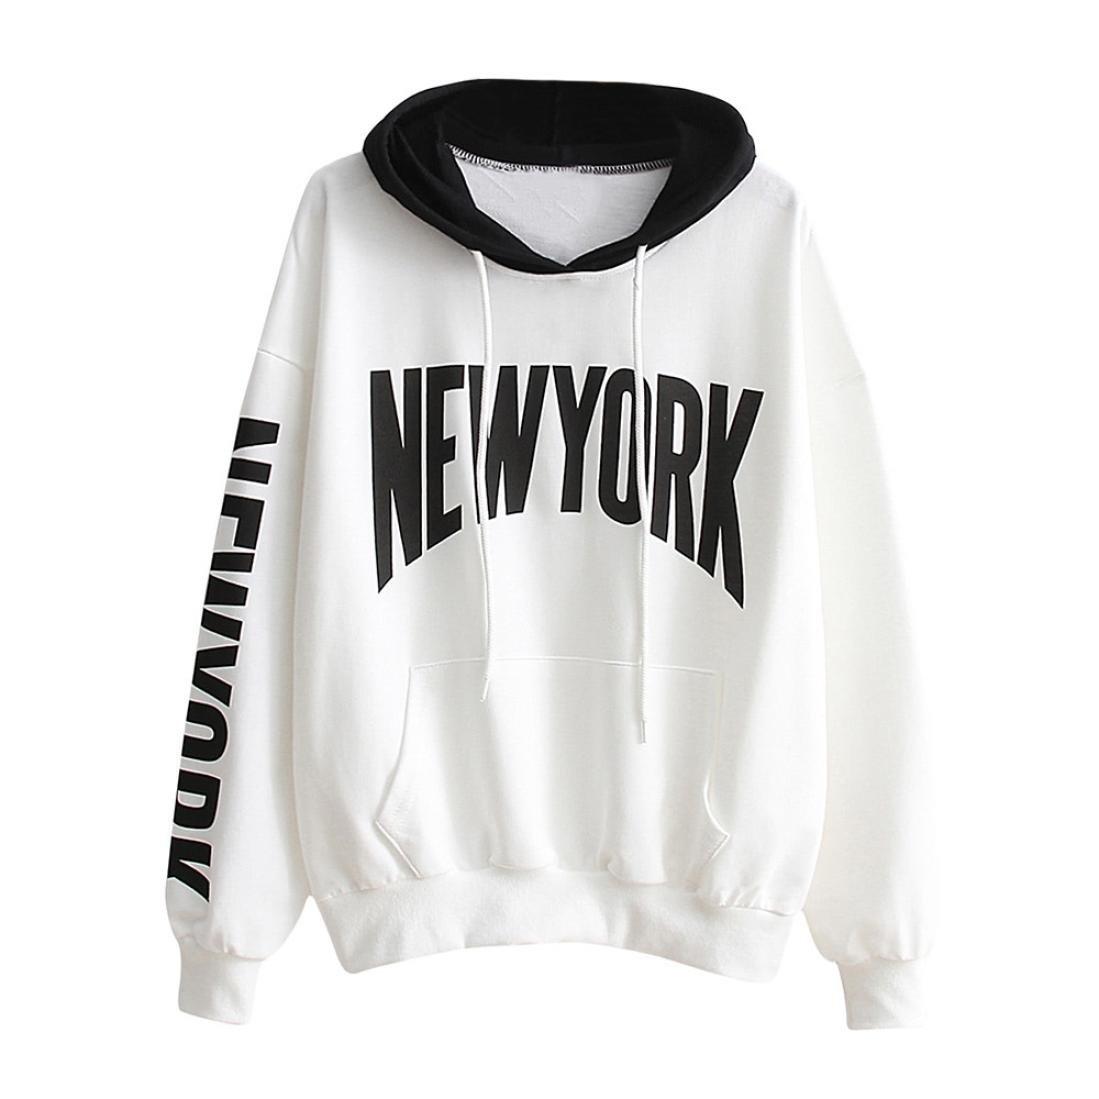 YANG-YI Womens Long Sleeve Letter Print Hoodie Sweatshirt Hooded Pullover Tops Casual Blouse